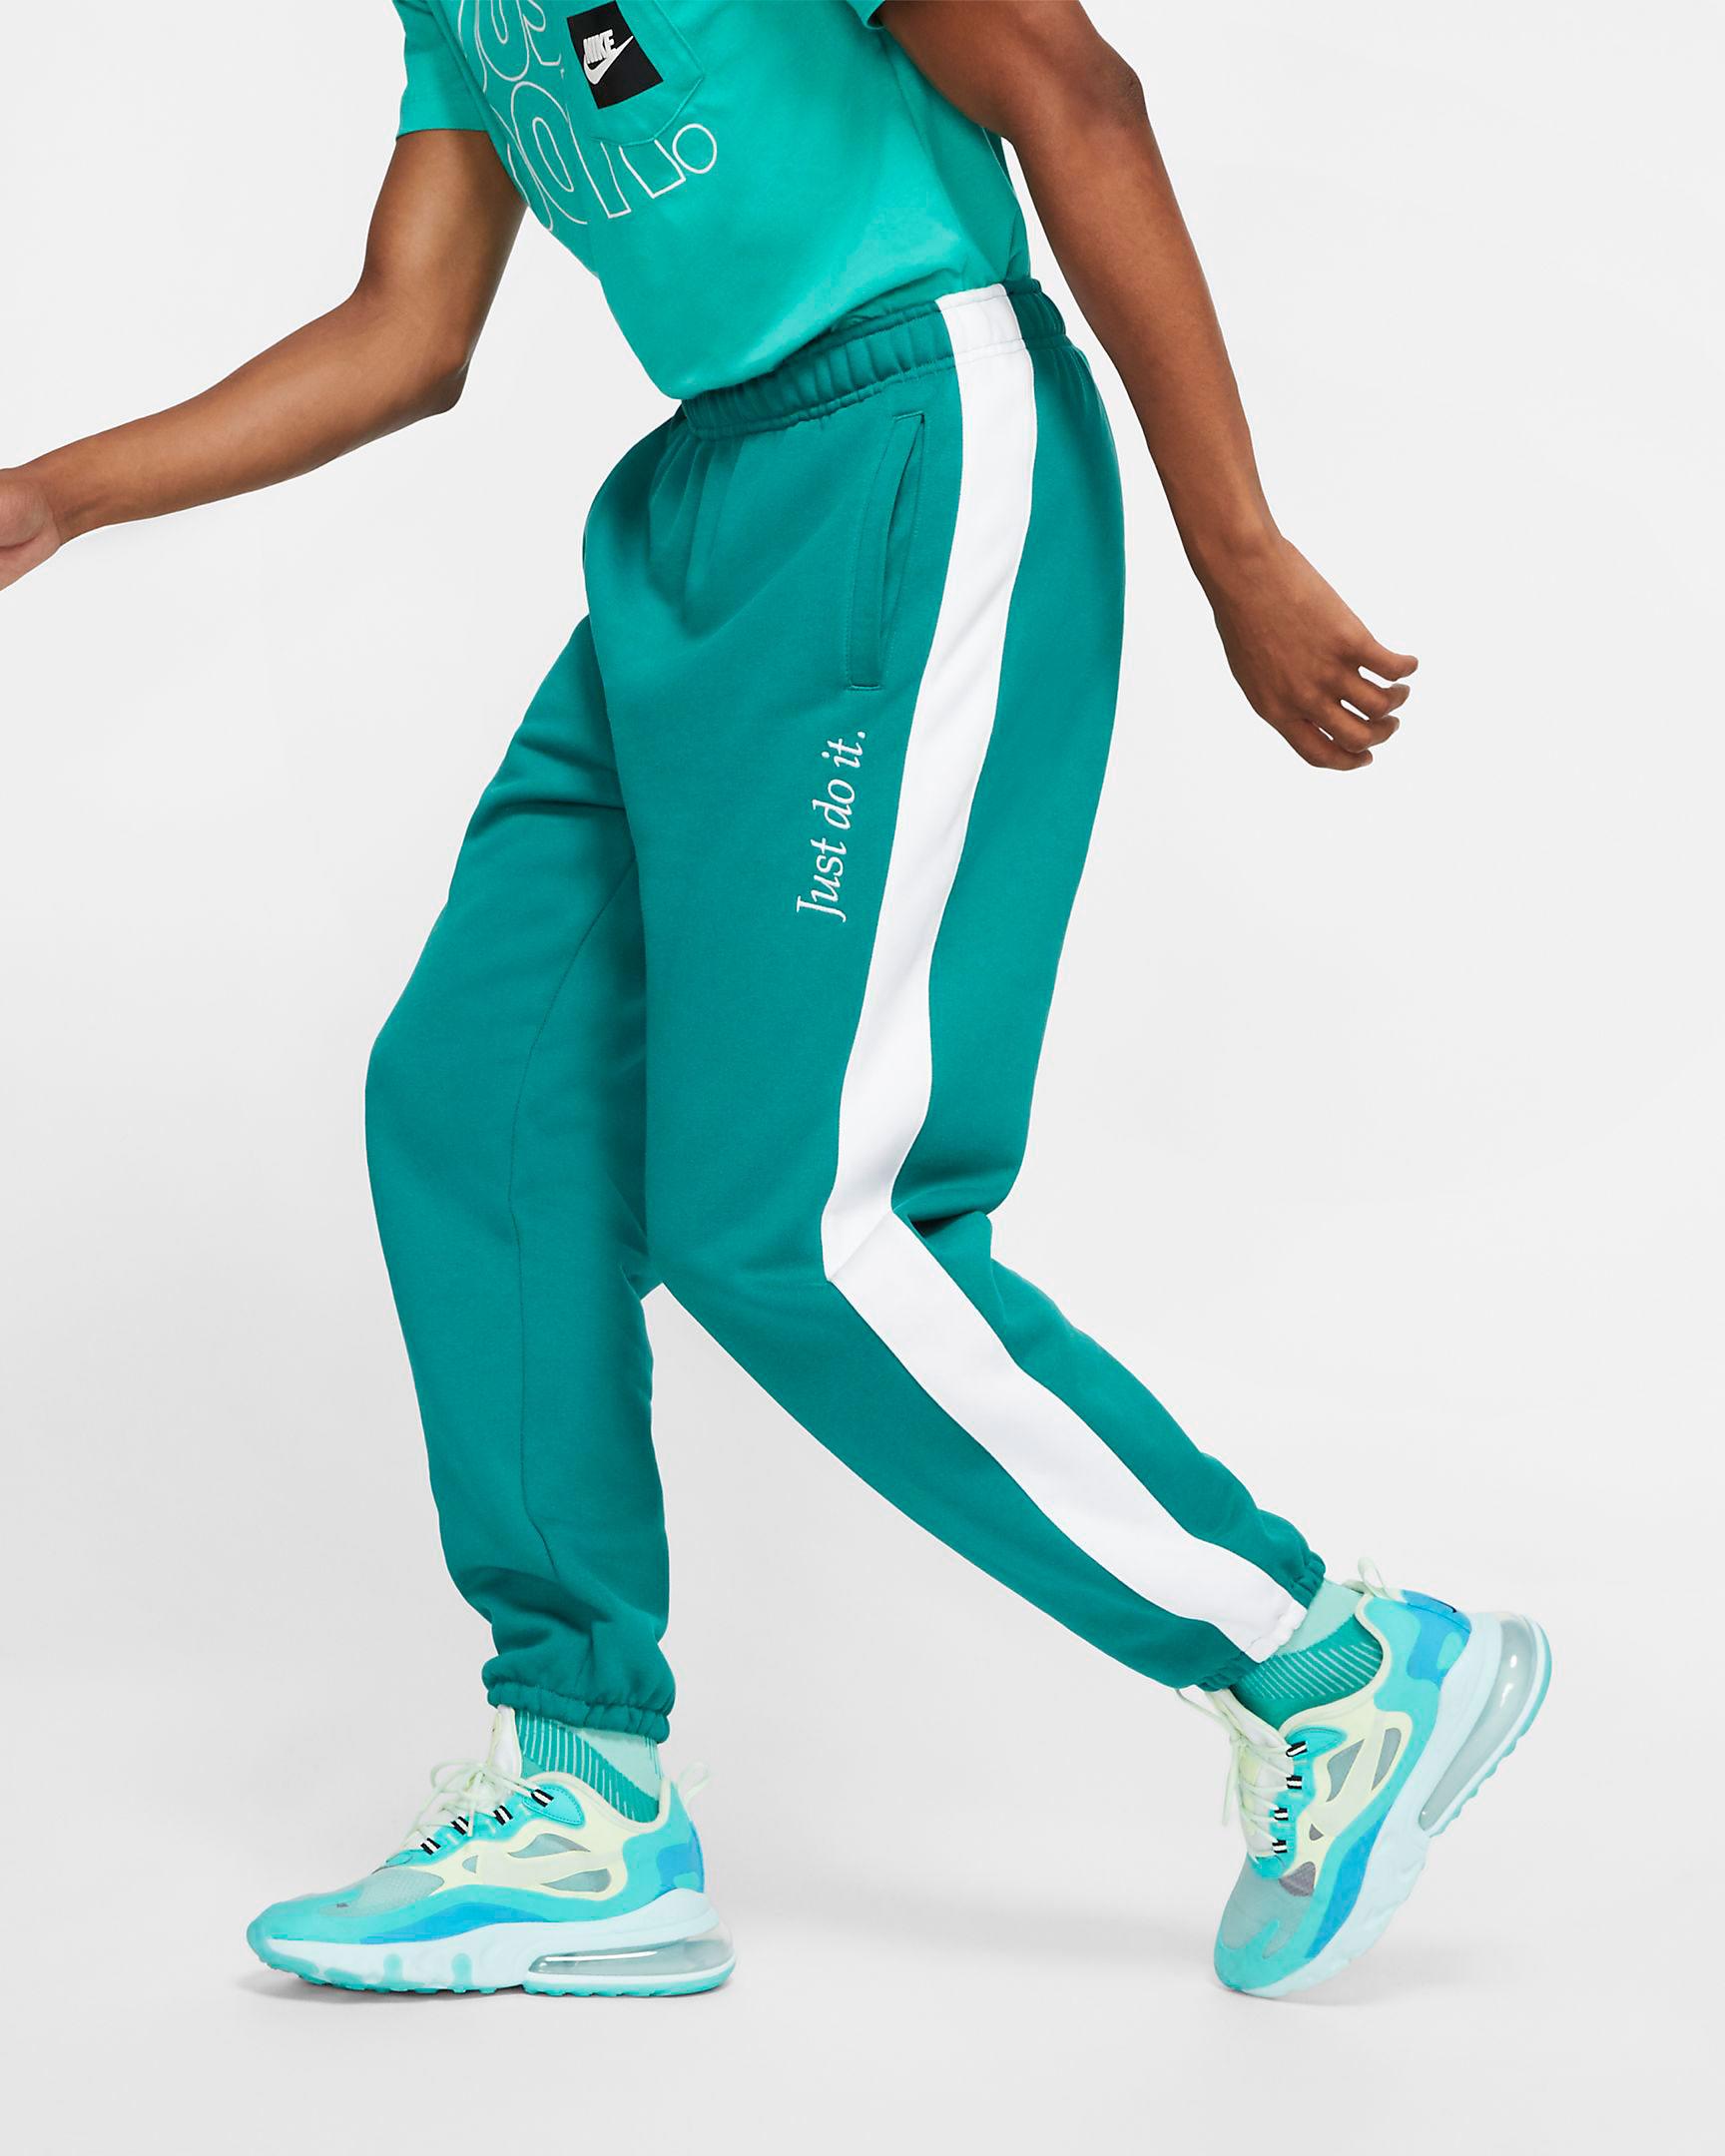 nike-island-green-just-do-it-jogger-pants-1